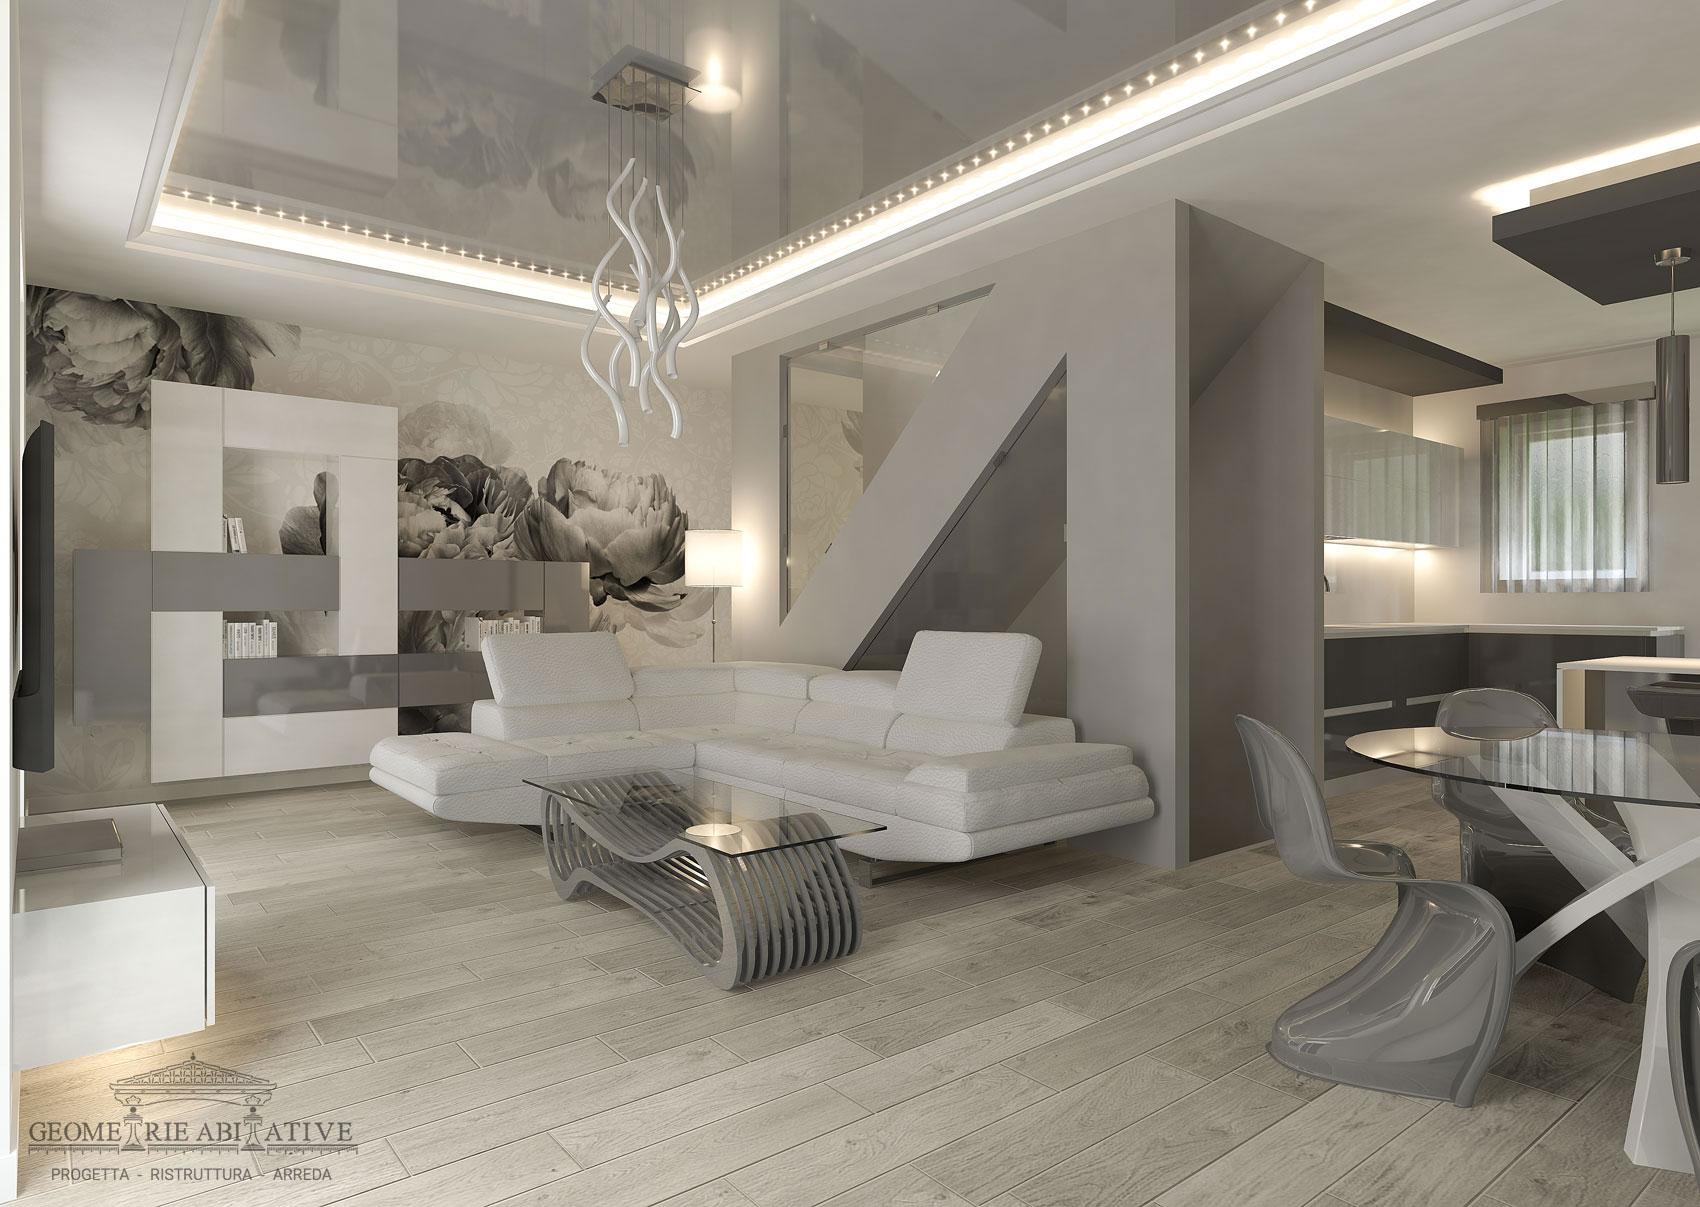 Casa con arredamento moderno geometrie abitative for Arredamento casa bianco